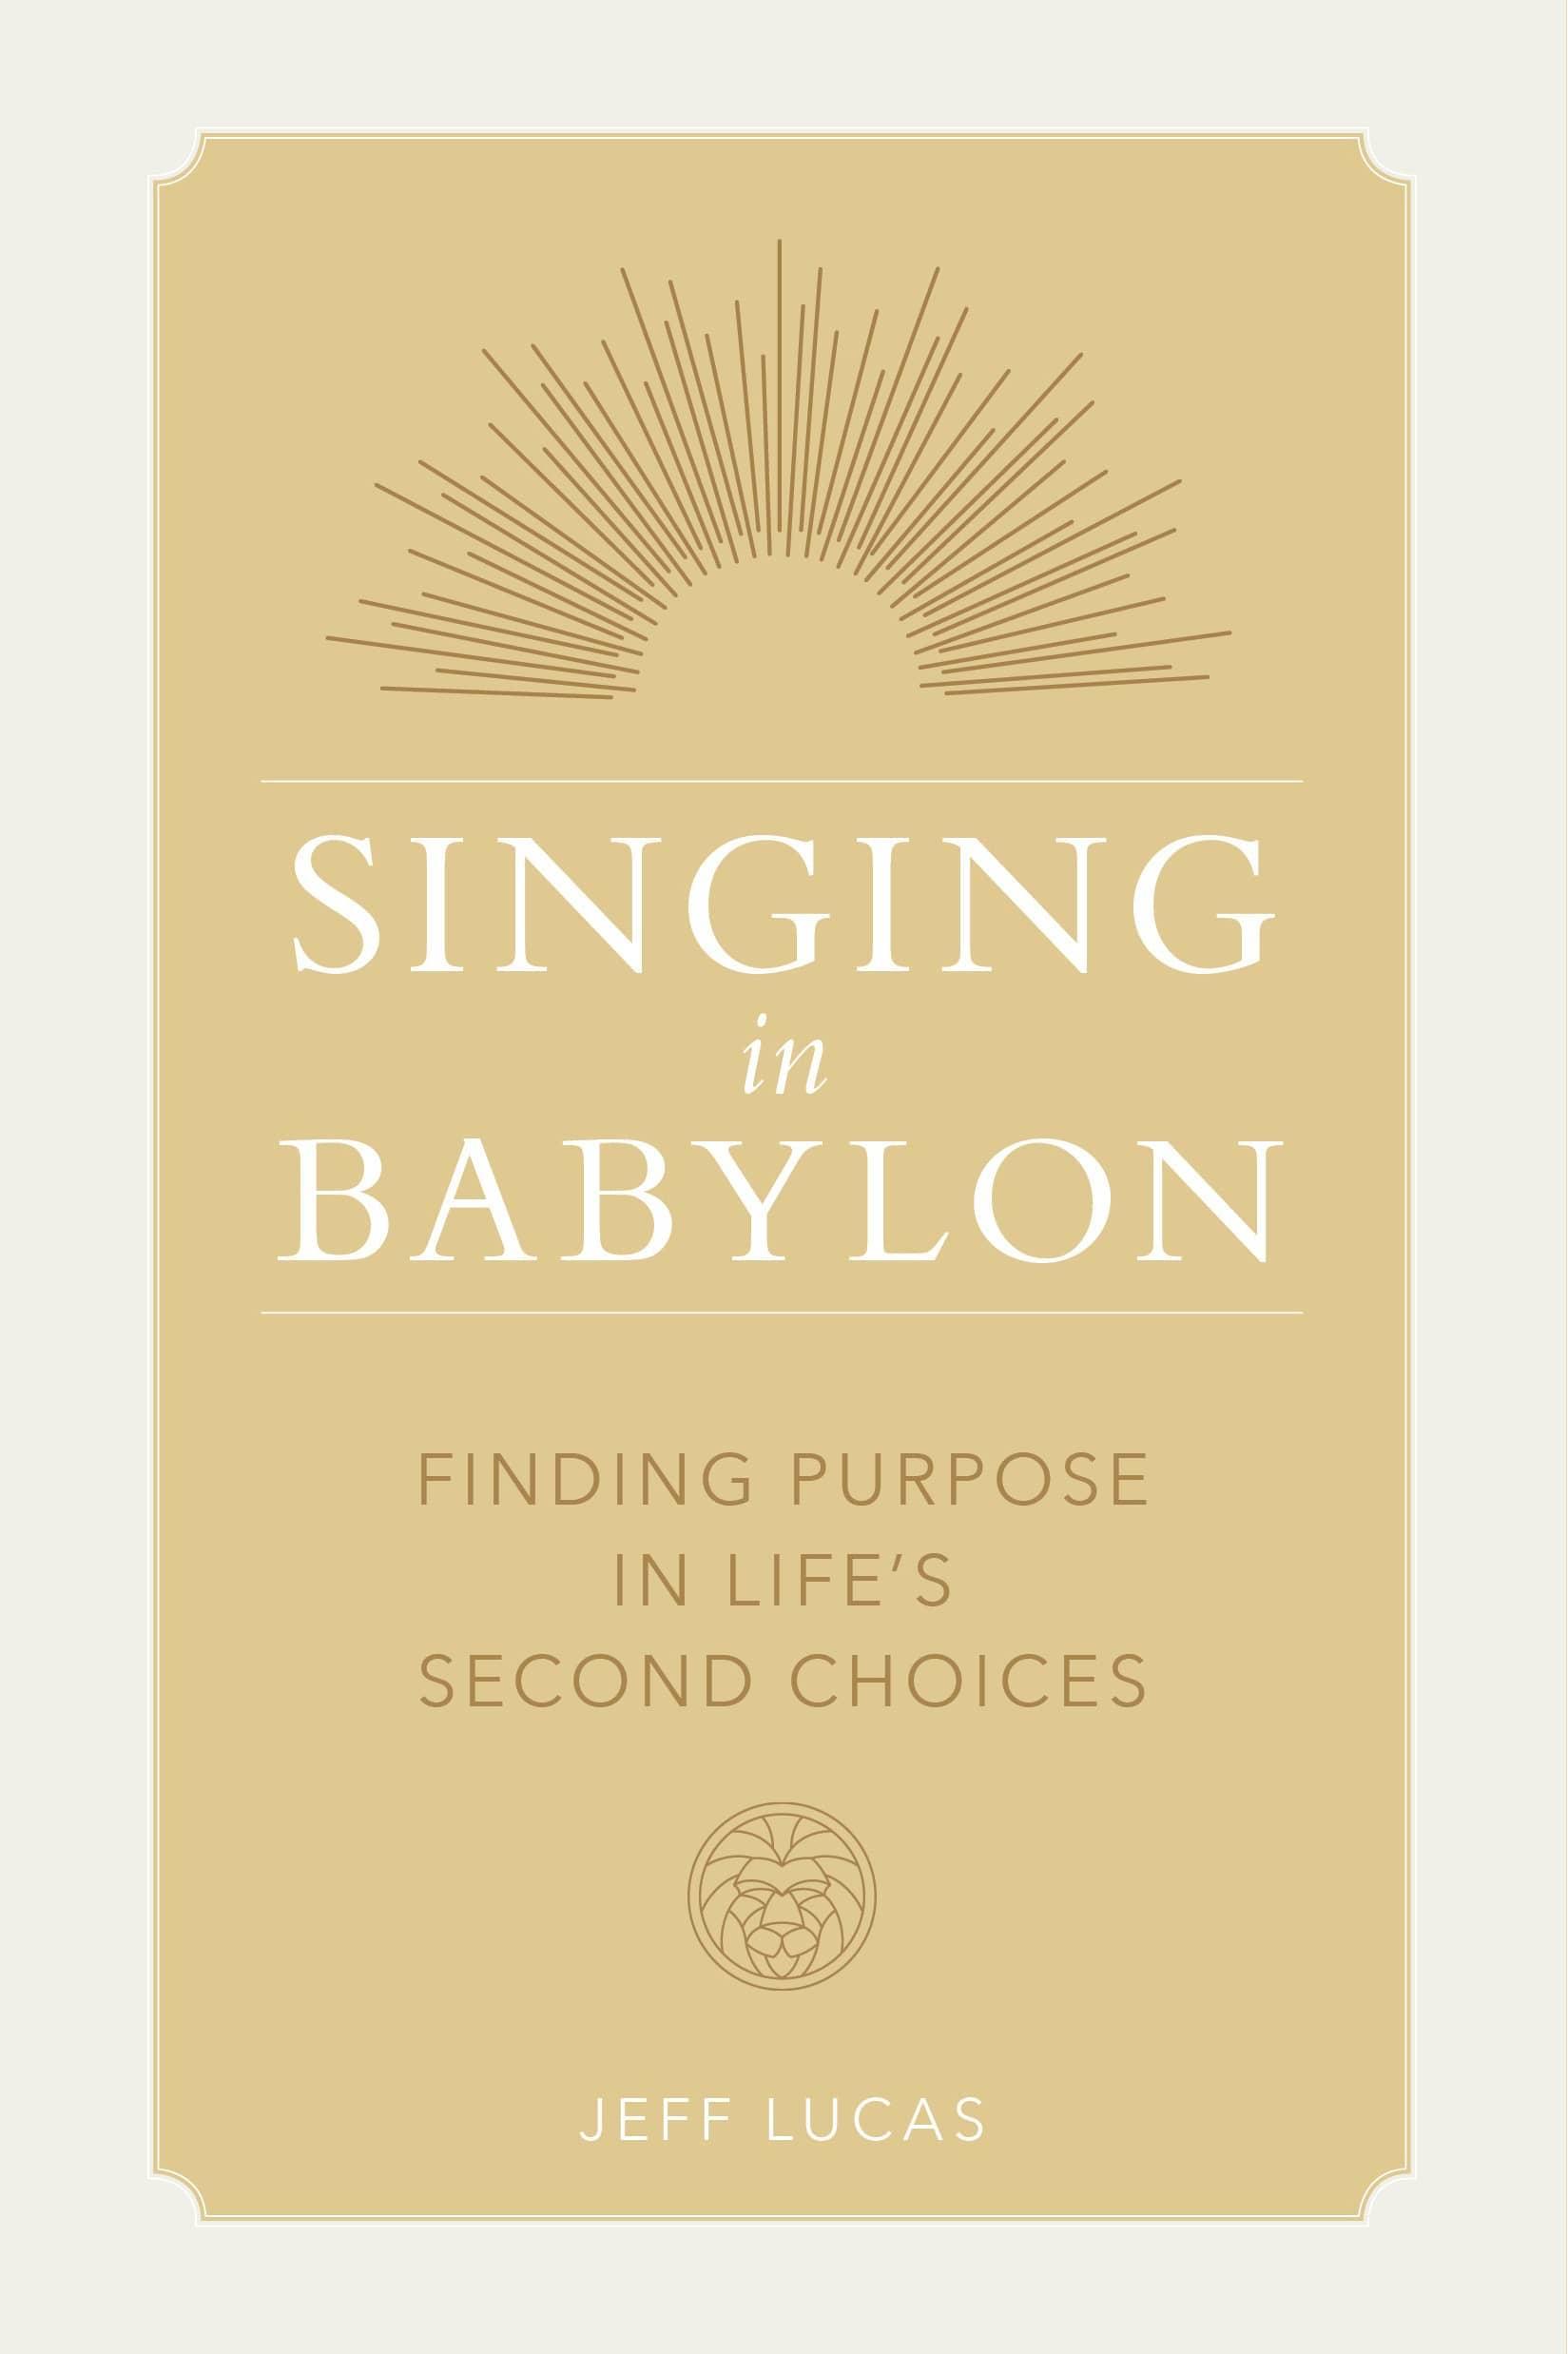 New Christian book Singing in Babylon